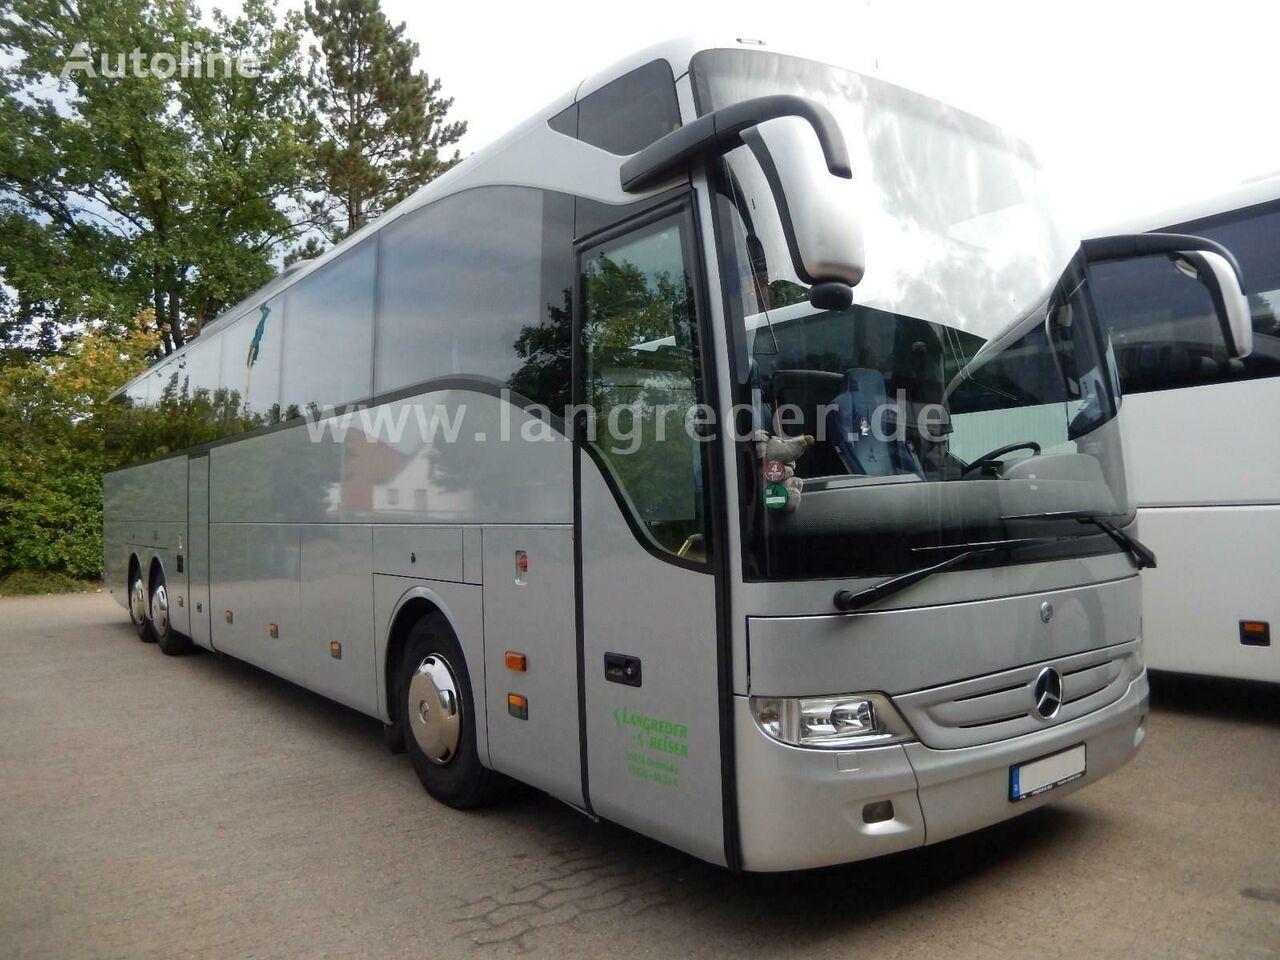 MERCEDES-BENZ Tourismo RHD-L Reisebus